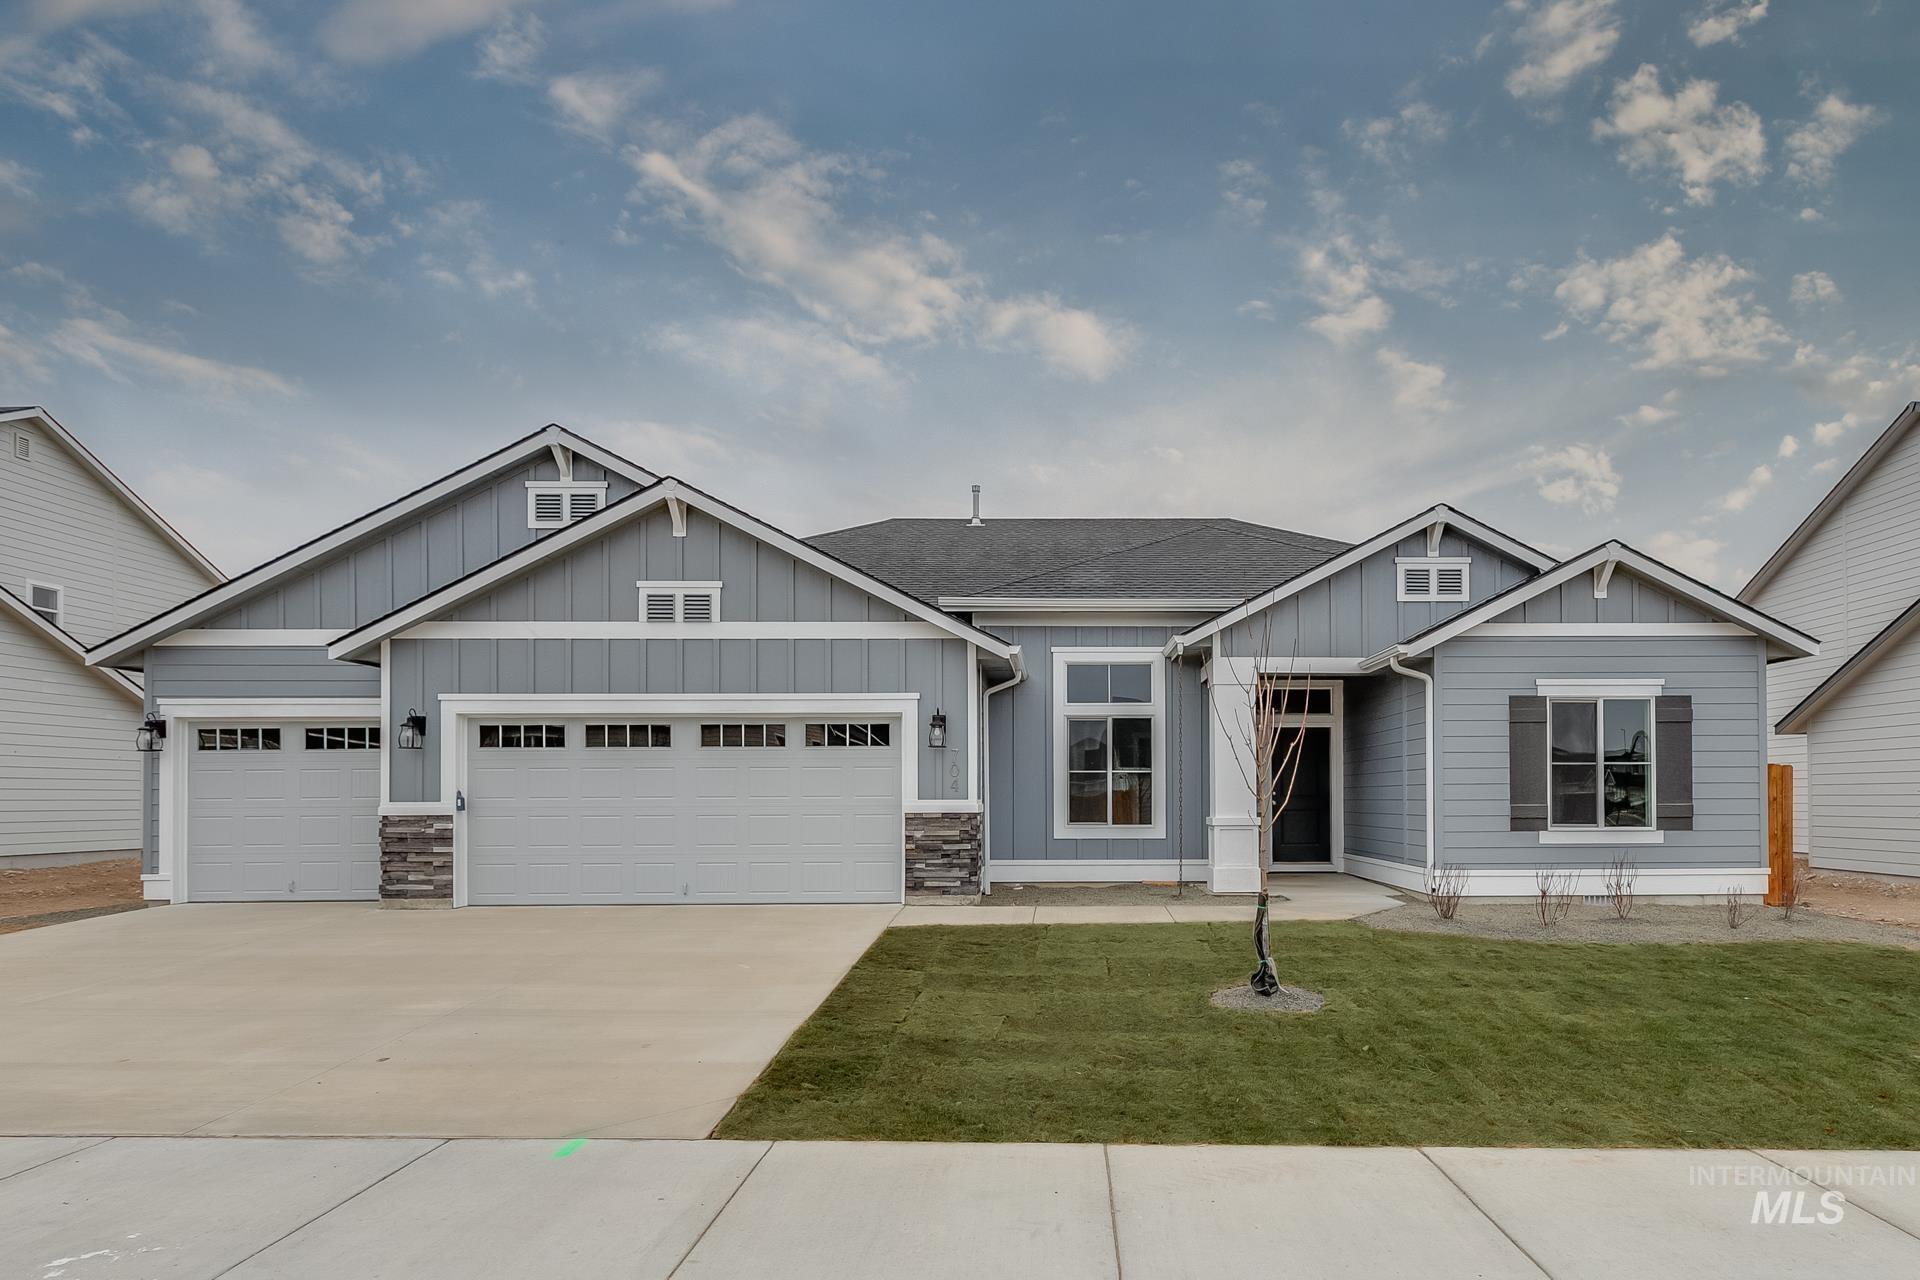 2843 N Klemmer Ave Property Photo - Kuna, ID real estate listing